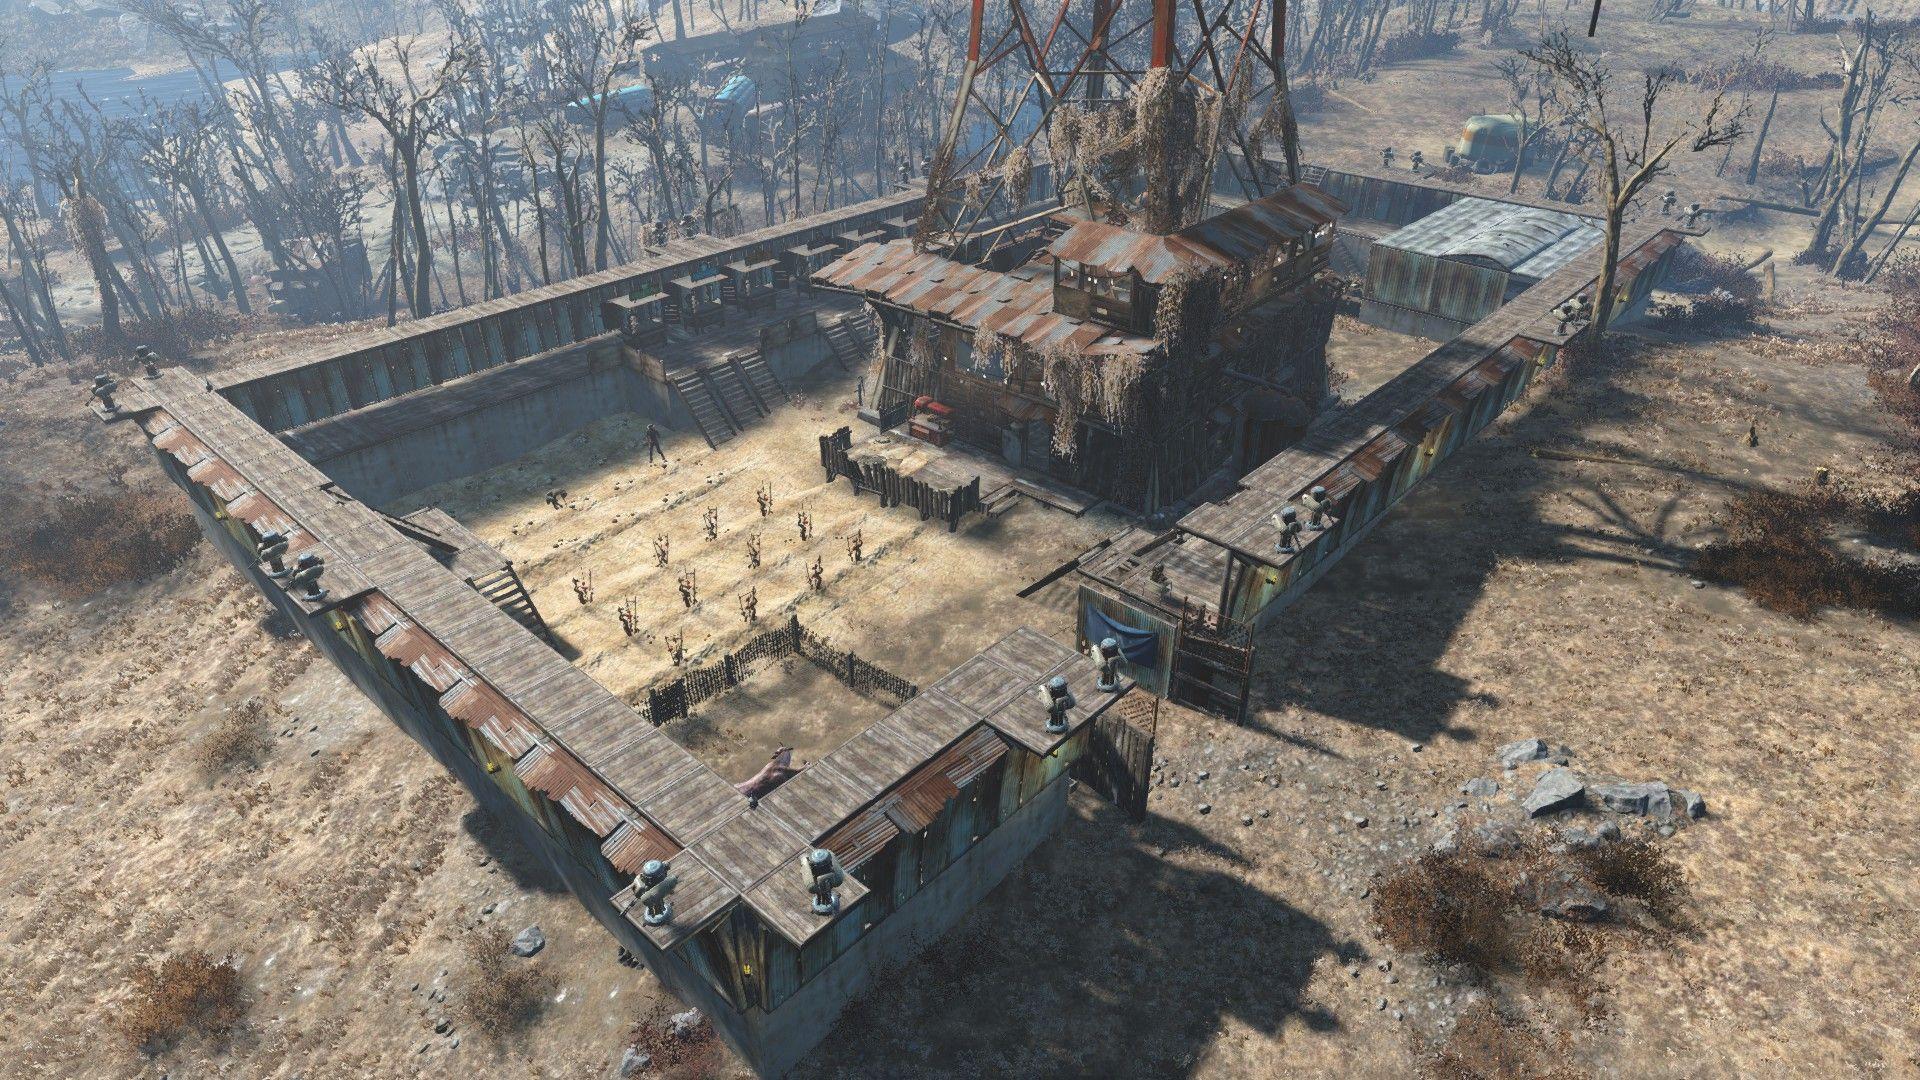 Xcqu1i6 Jpg 1920 215 1080 Fallout 4 Settlement Ideas